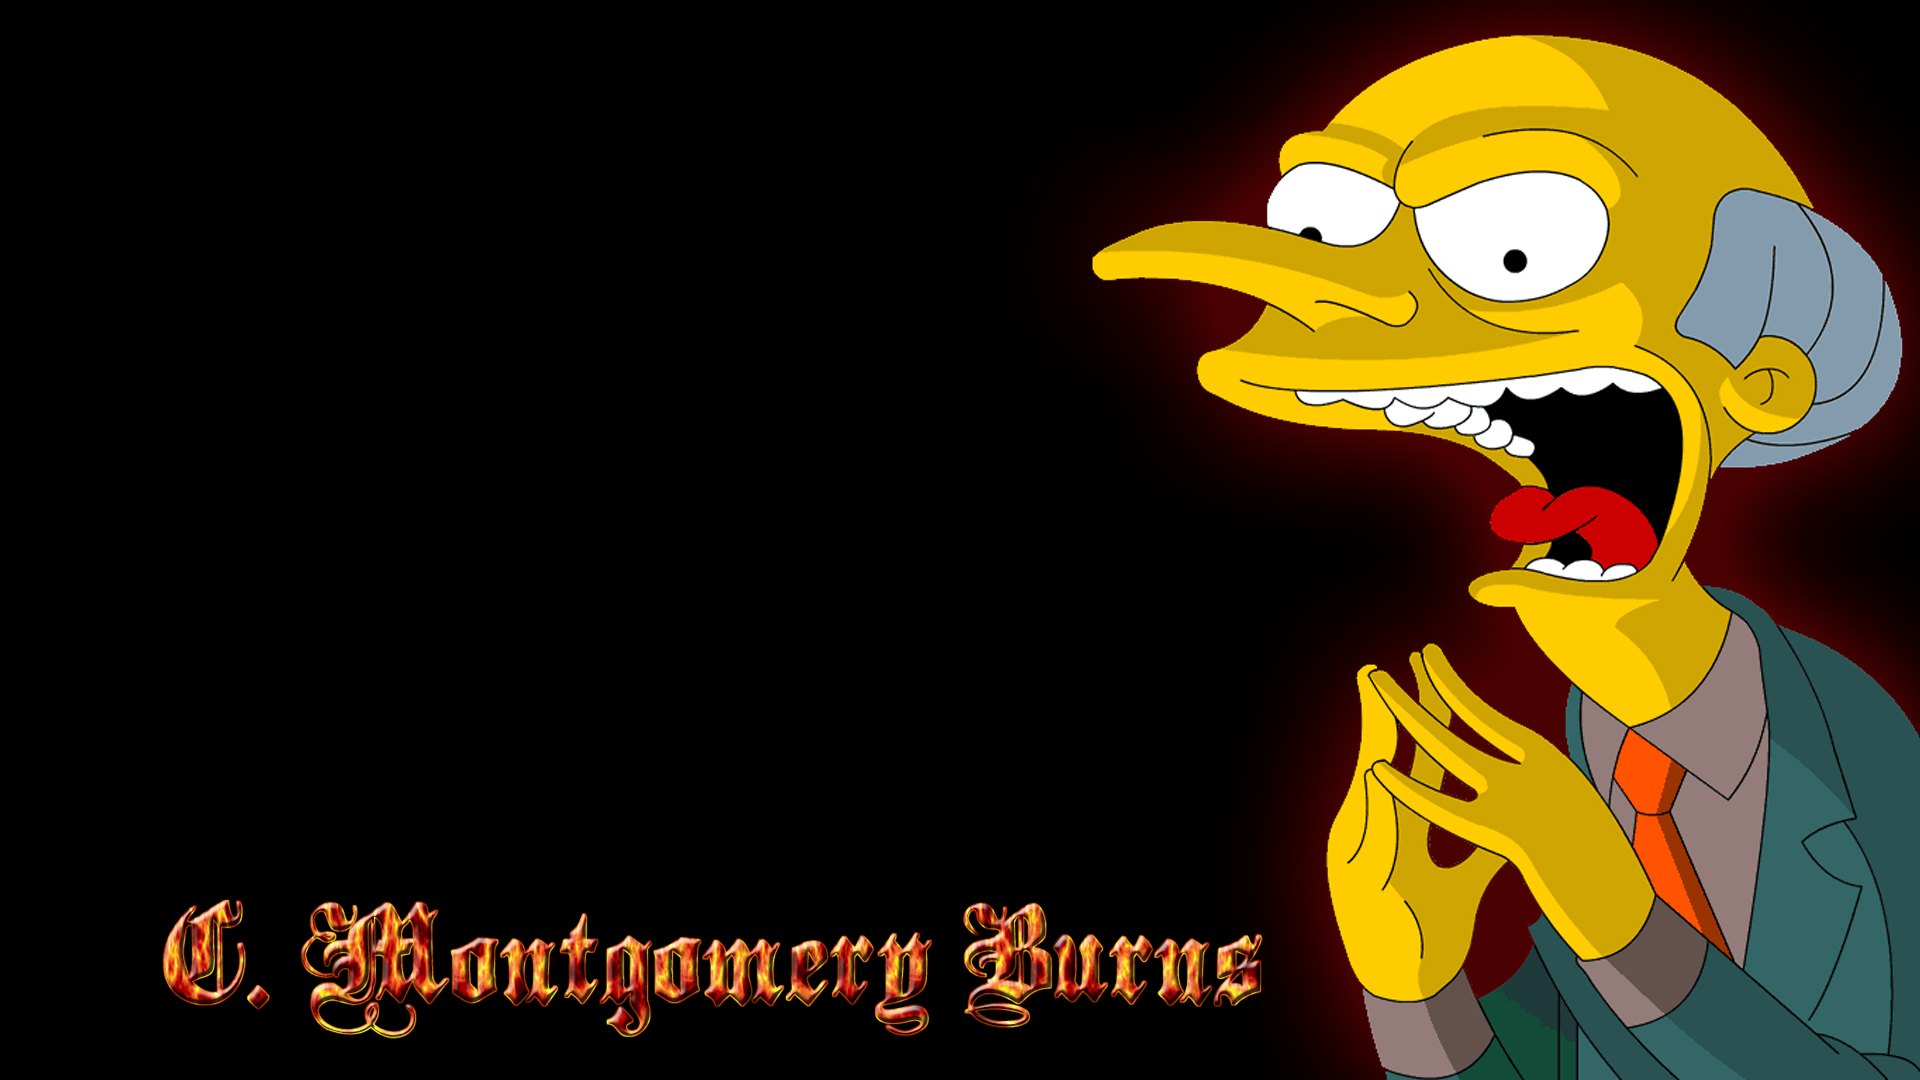 Programma Televisivo - I Simpson  Burns Montgomery Burns Sfondo